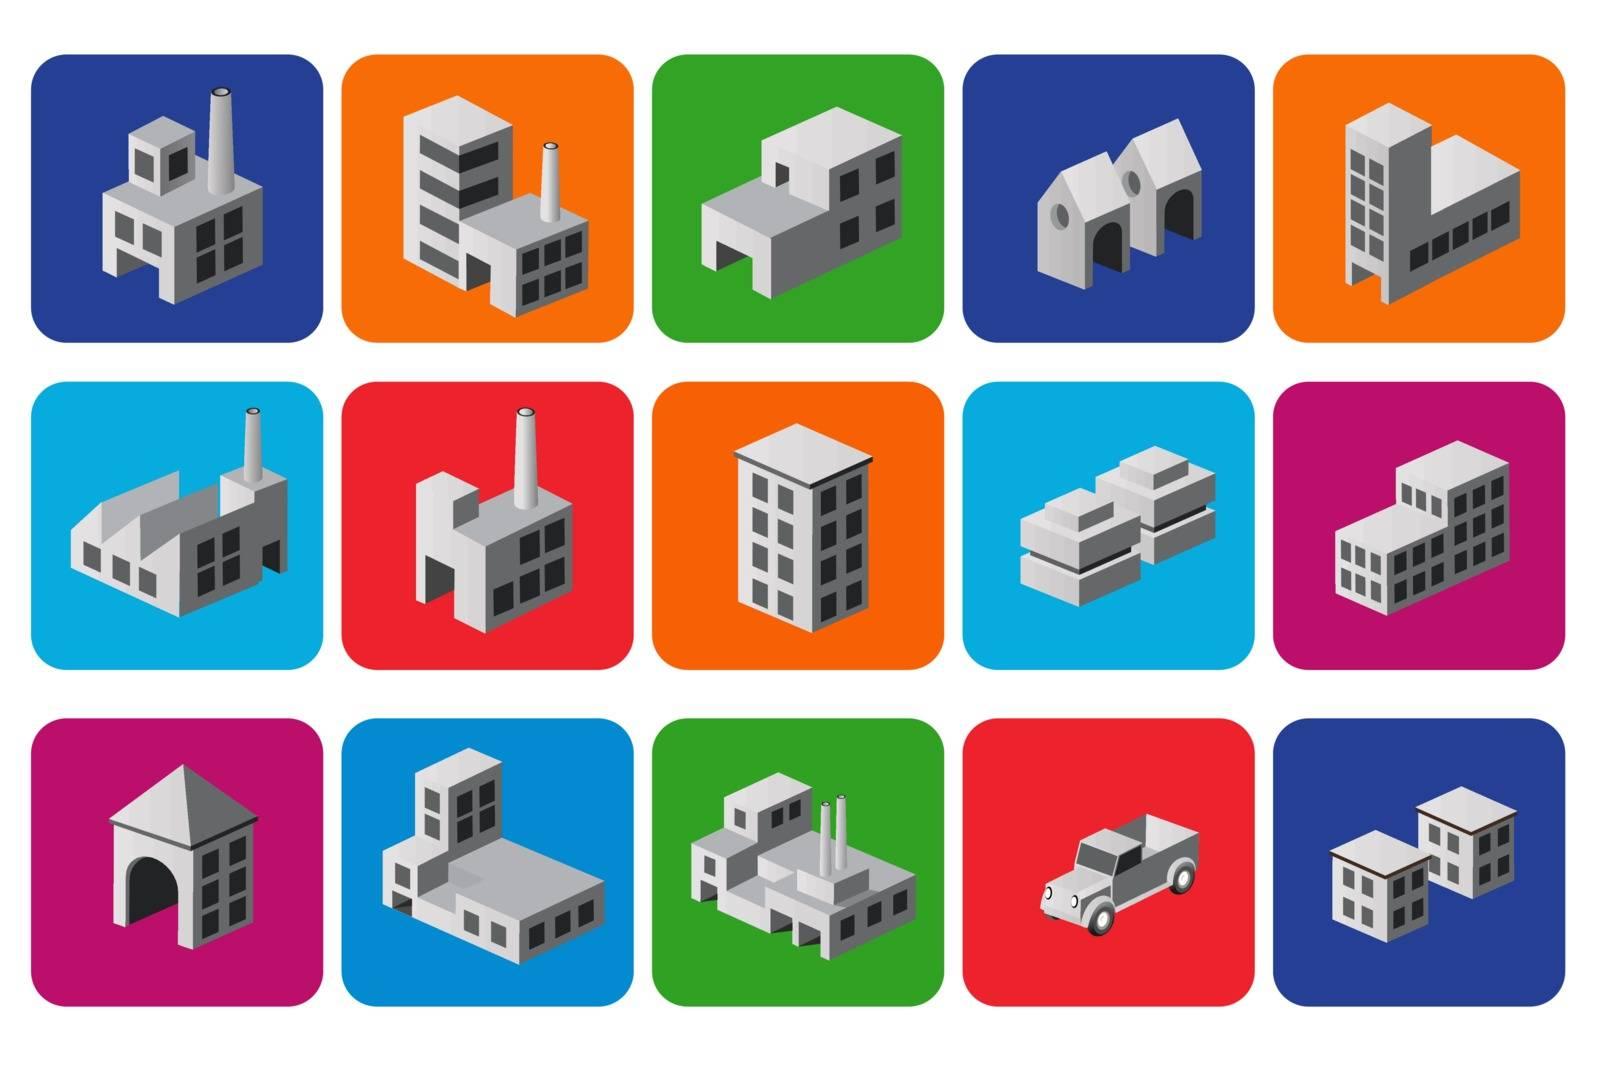 Set of icons isometric house, city symbols and icons. City icons.